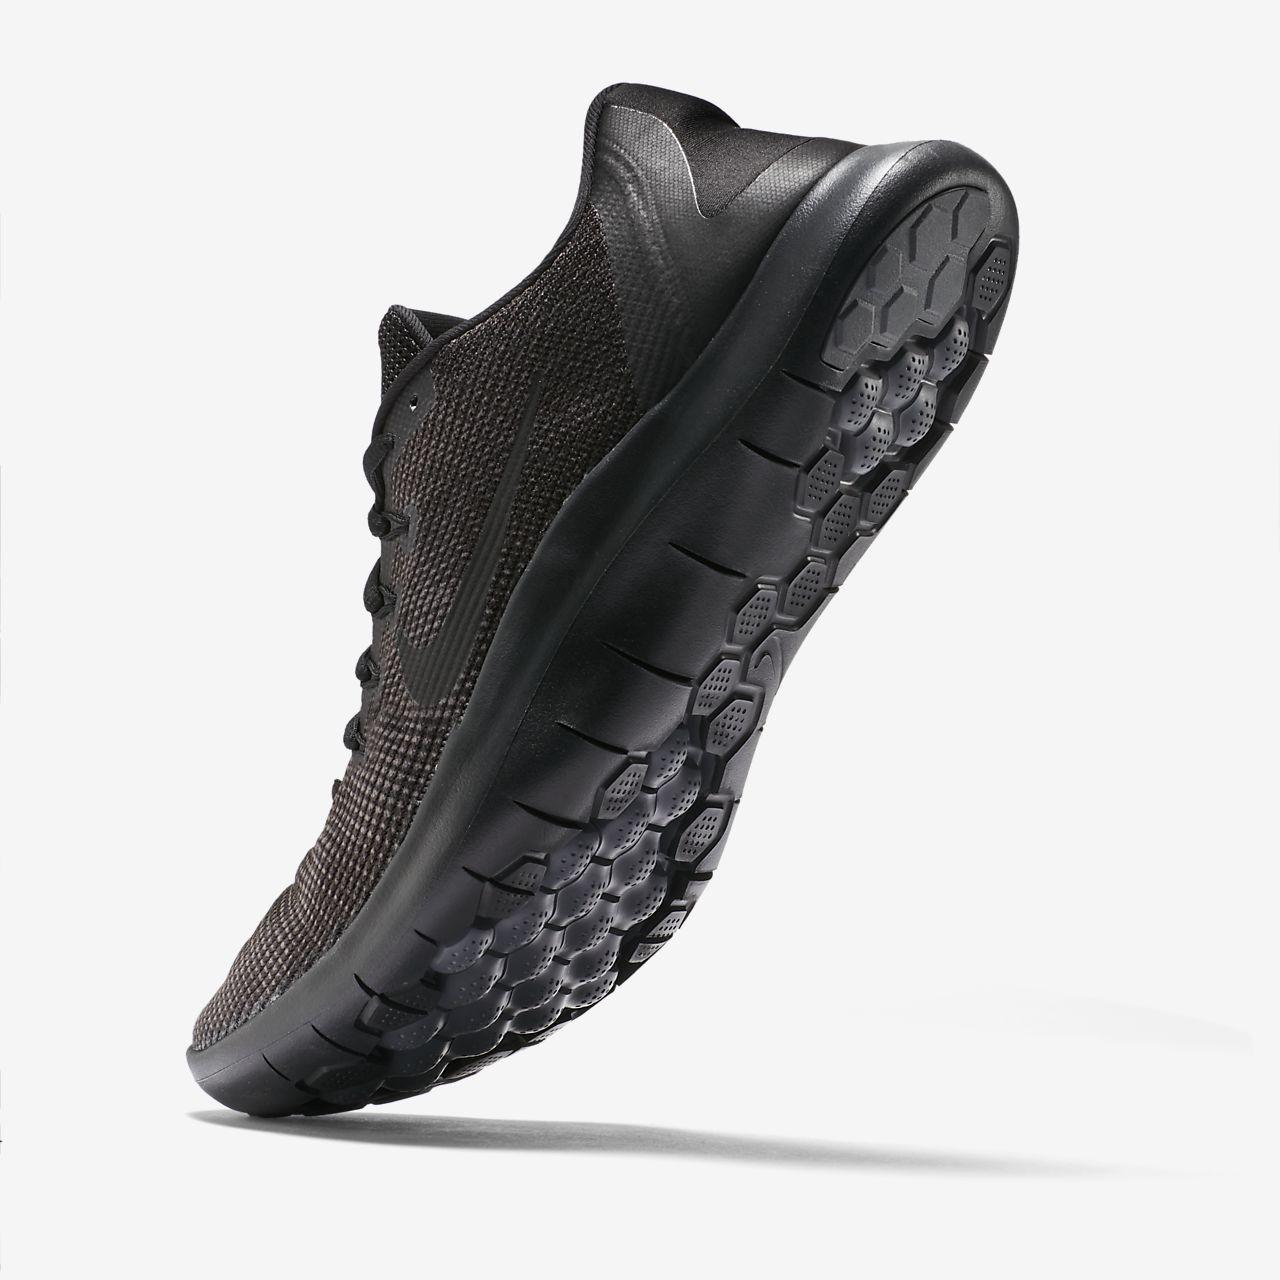 7c7f1aa4a1a58 Nike Flex 2018 RN Men s Running Shoe. Nike.com NL